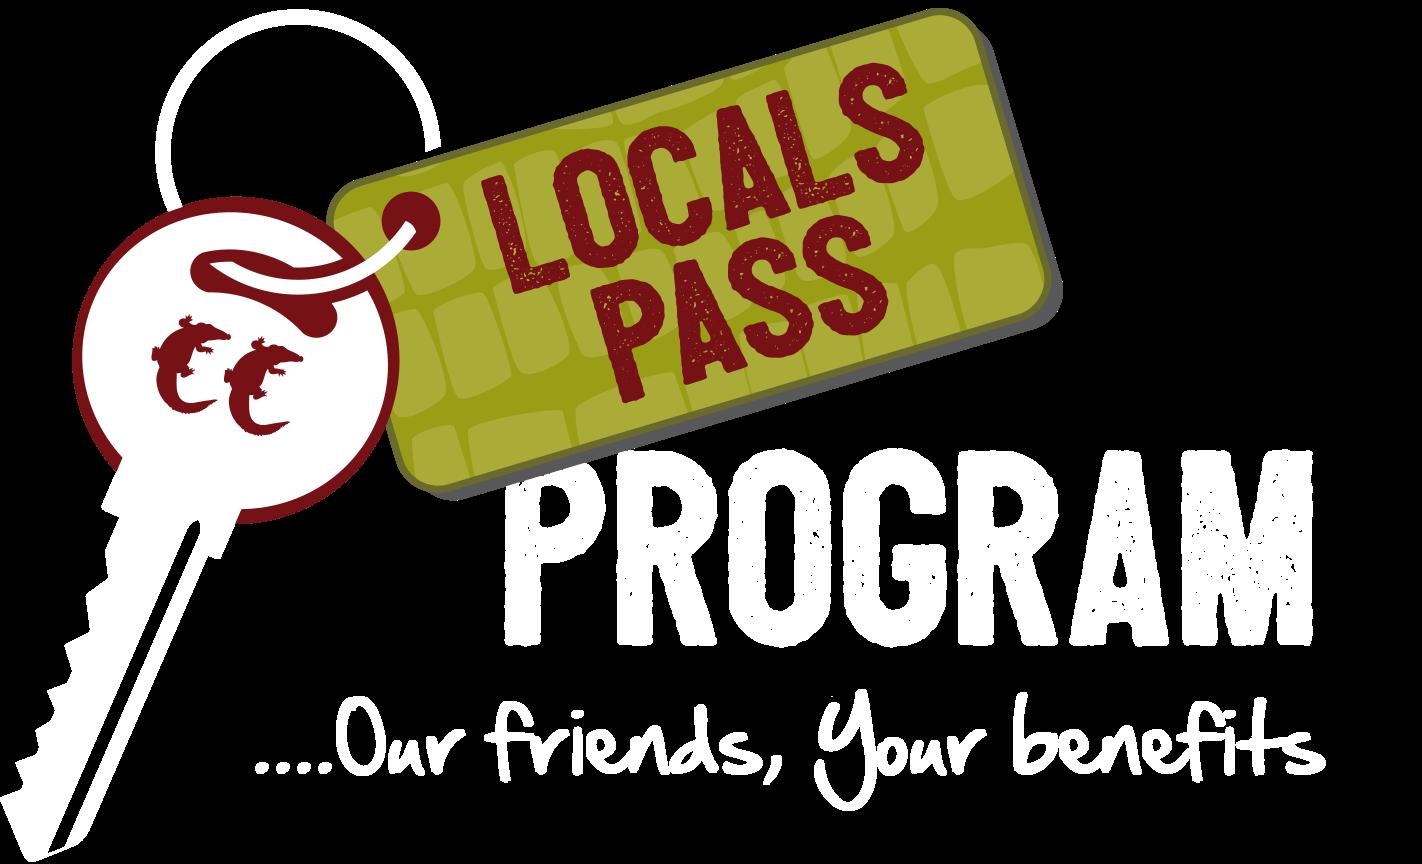 Locals Pass